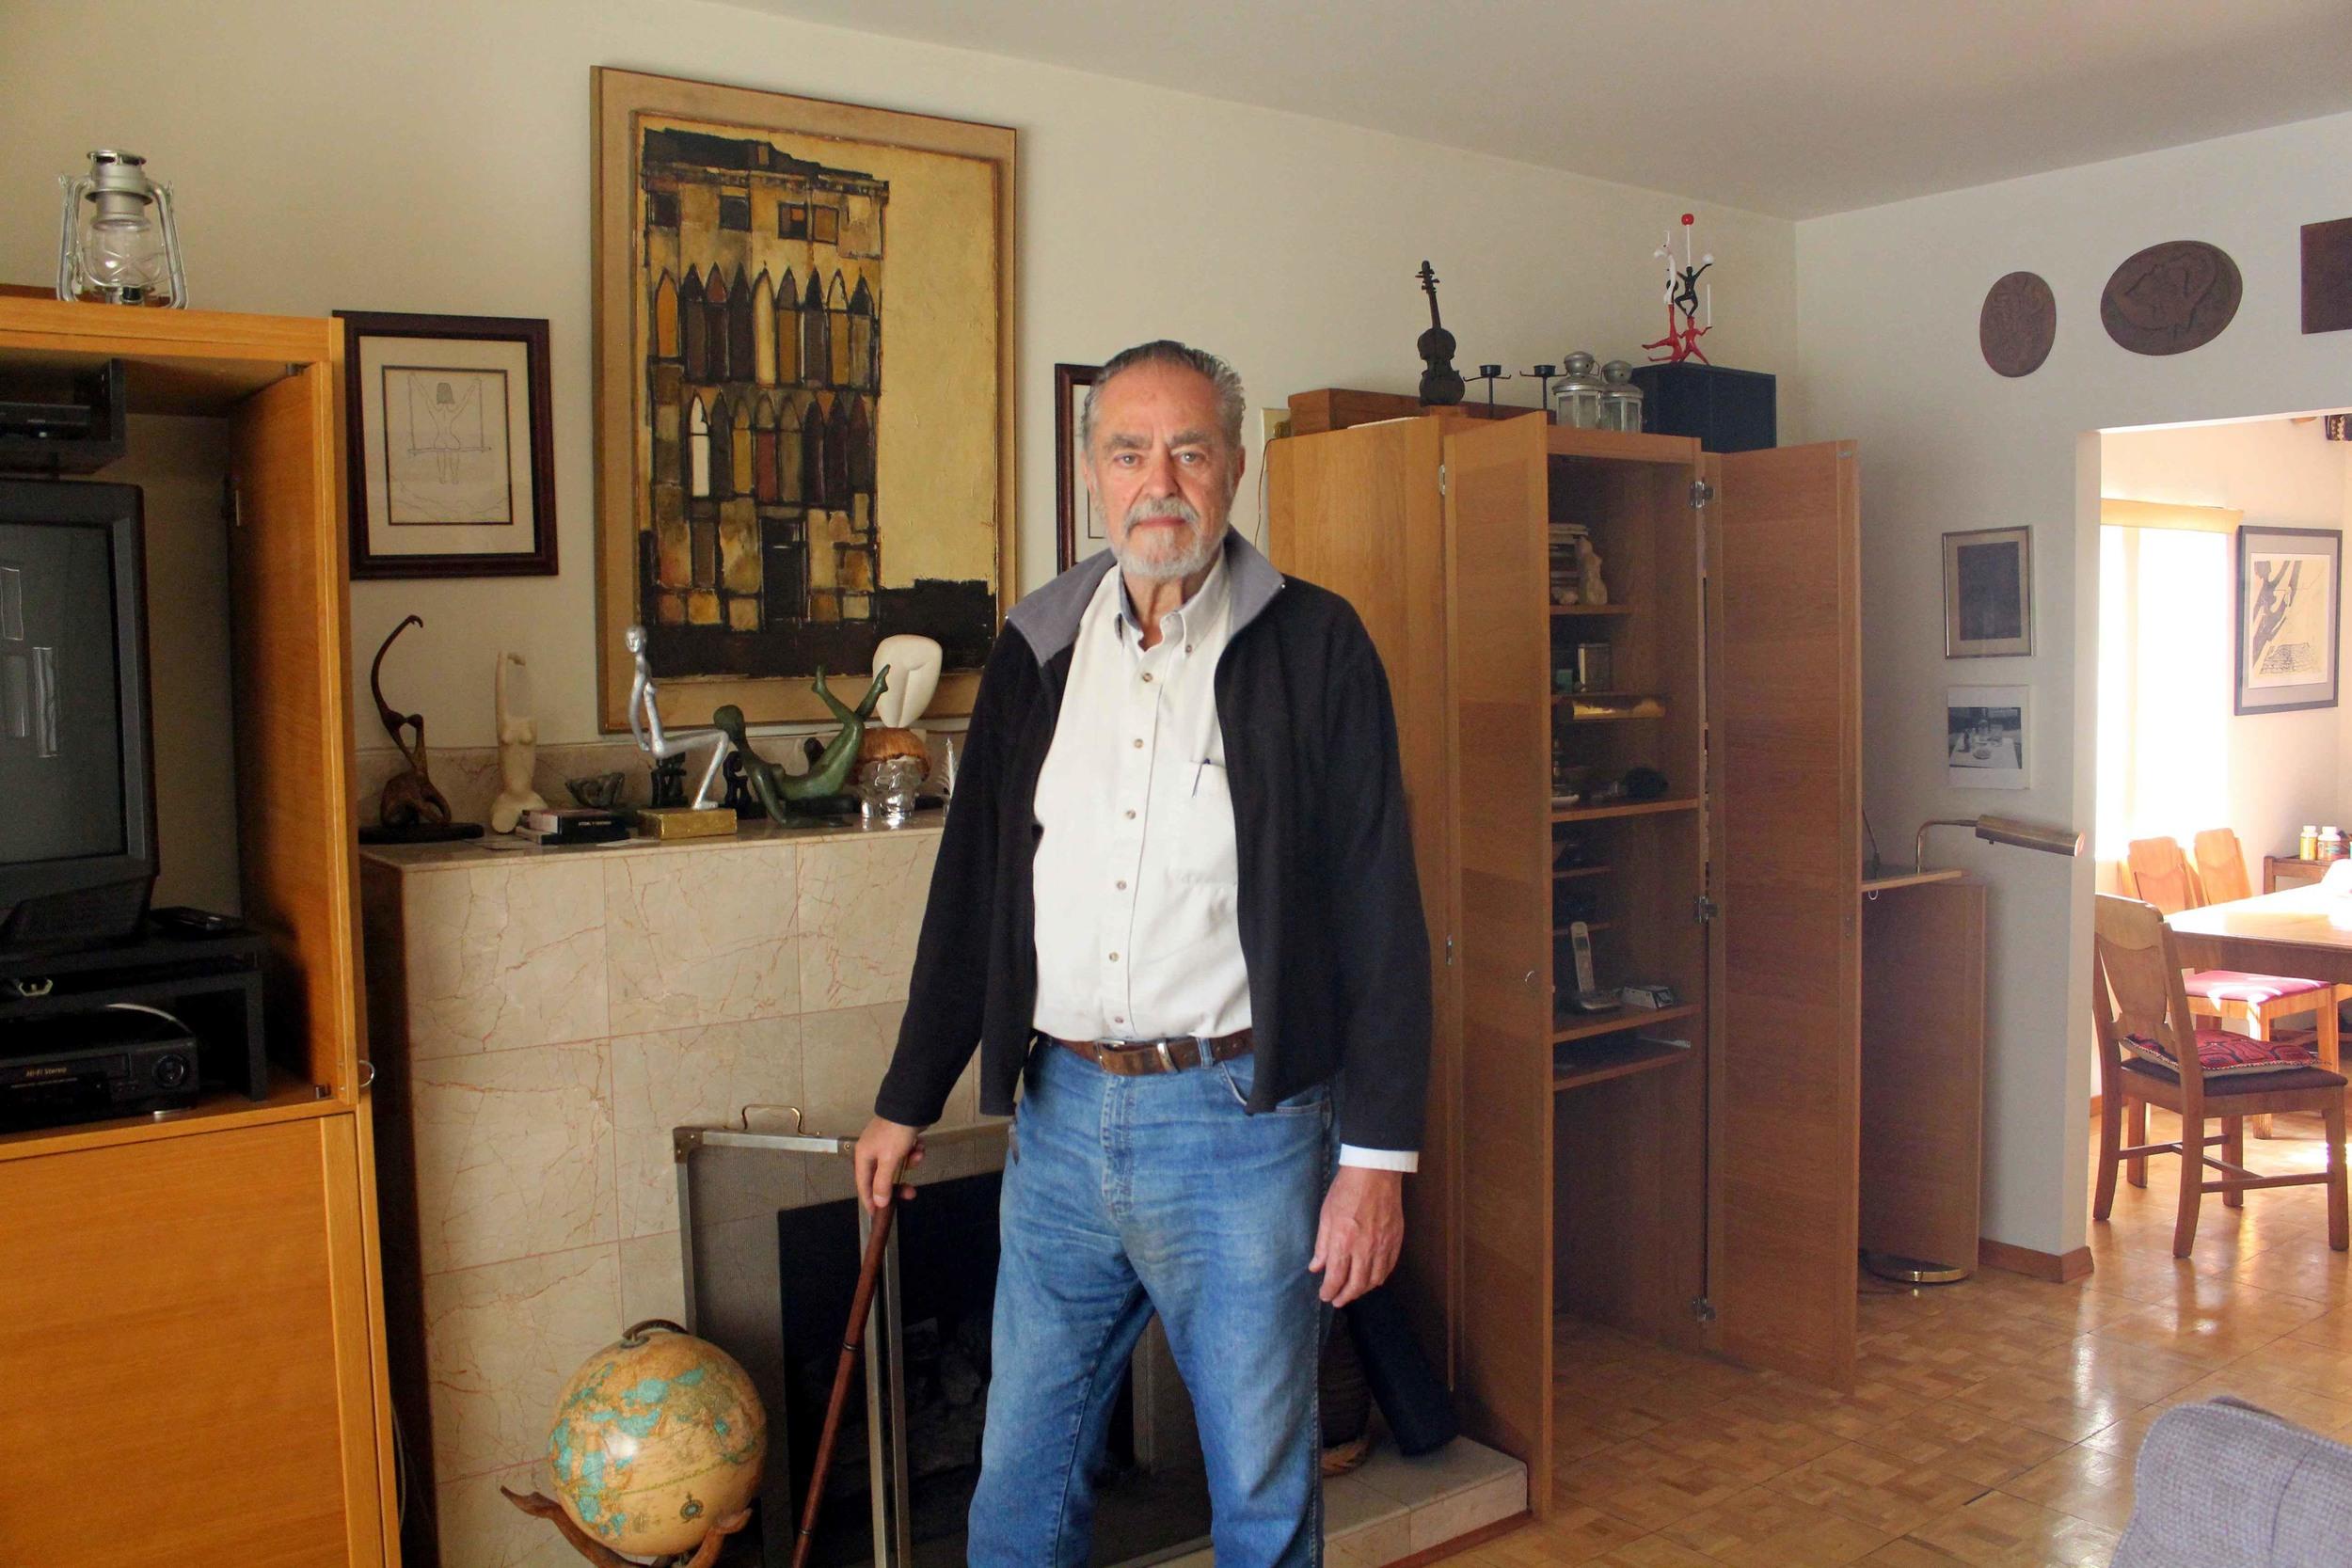 Rafael Buñuel in his studio/home. Photo by Gary Eisenberg